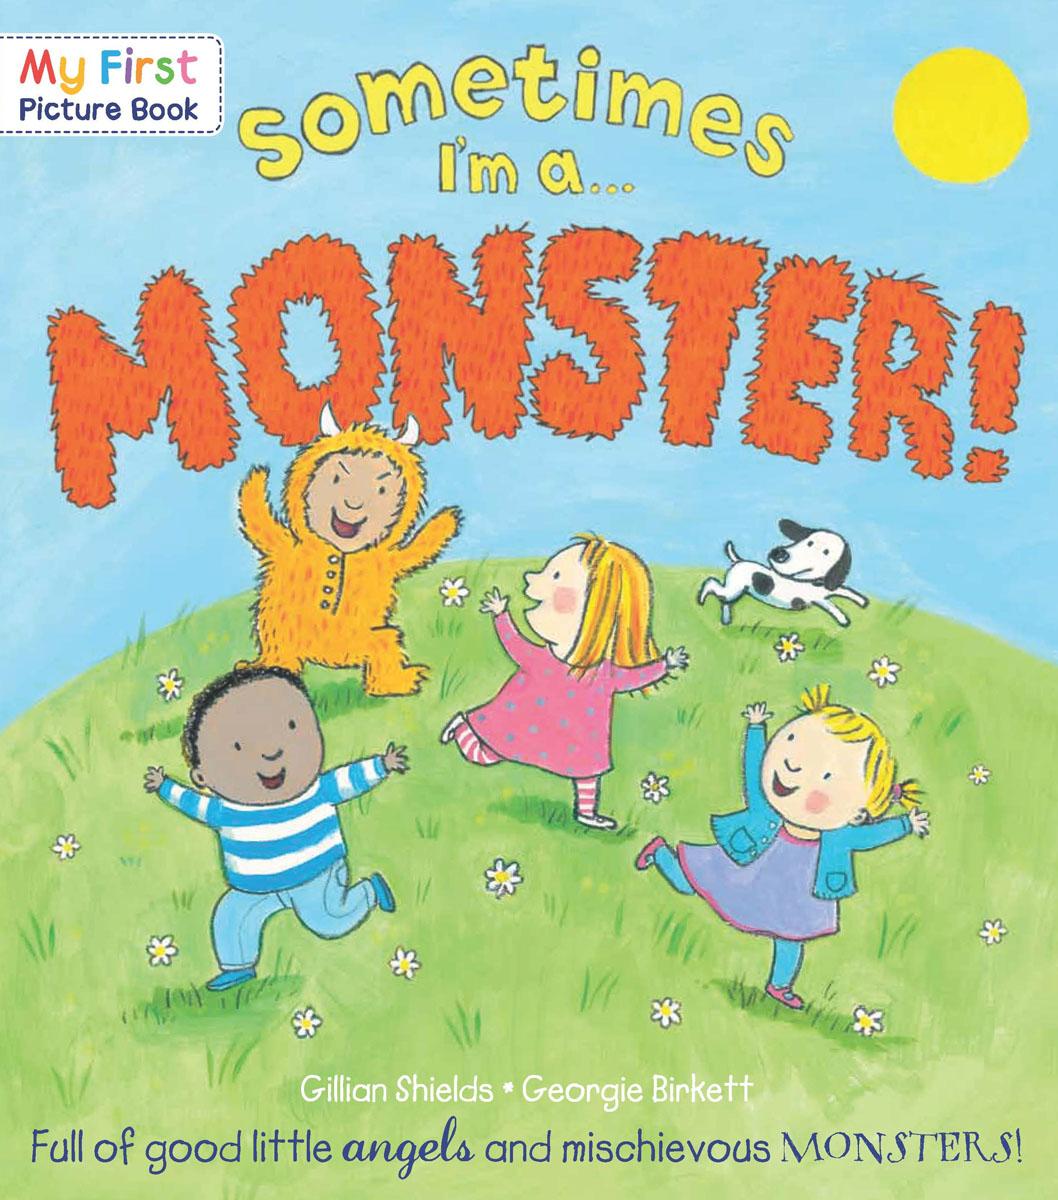 Sometimes I'm a Monster sometimes sometimes so033awjbf31 page 9